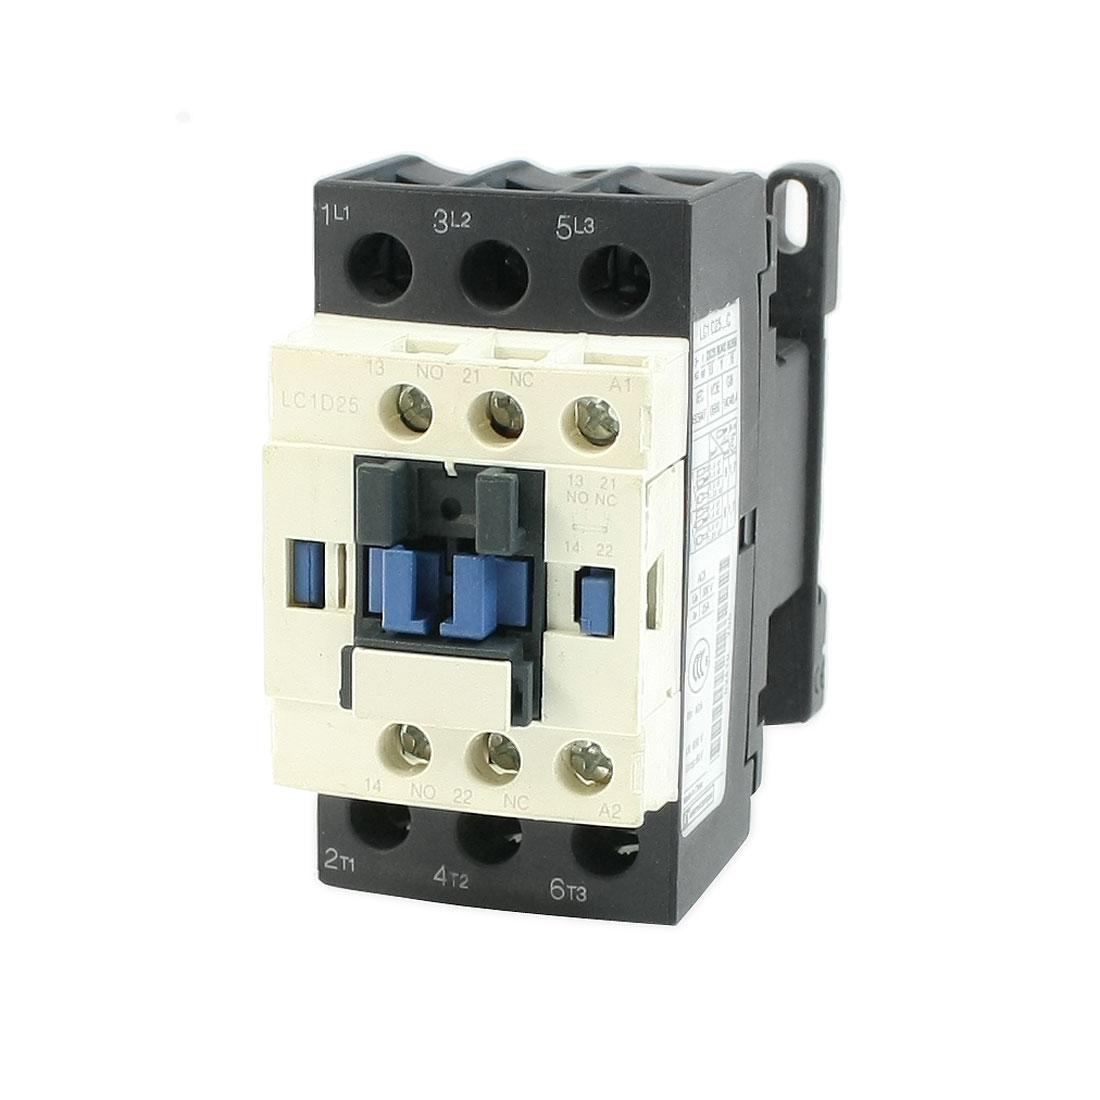 LC1D25 AC Contactor 110V 50/60Hz Coil 3-Pole NO NC